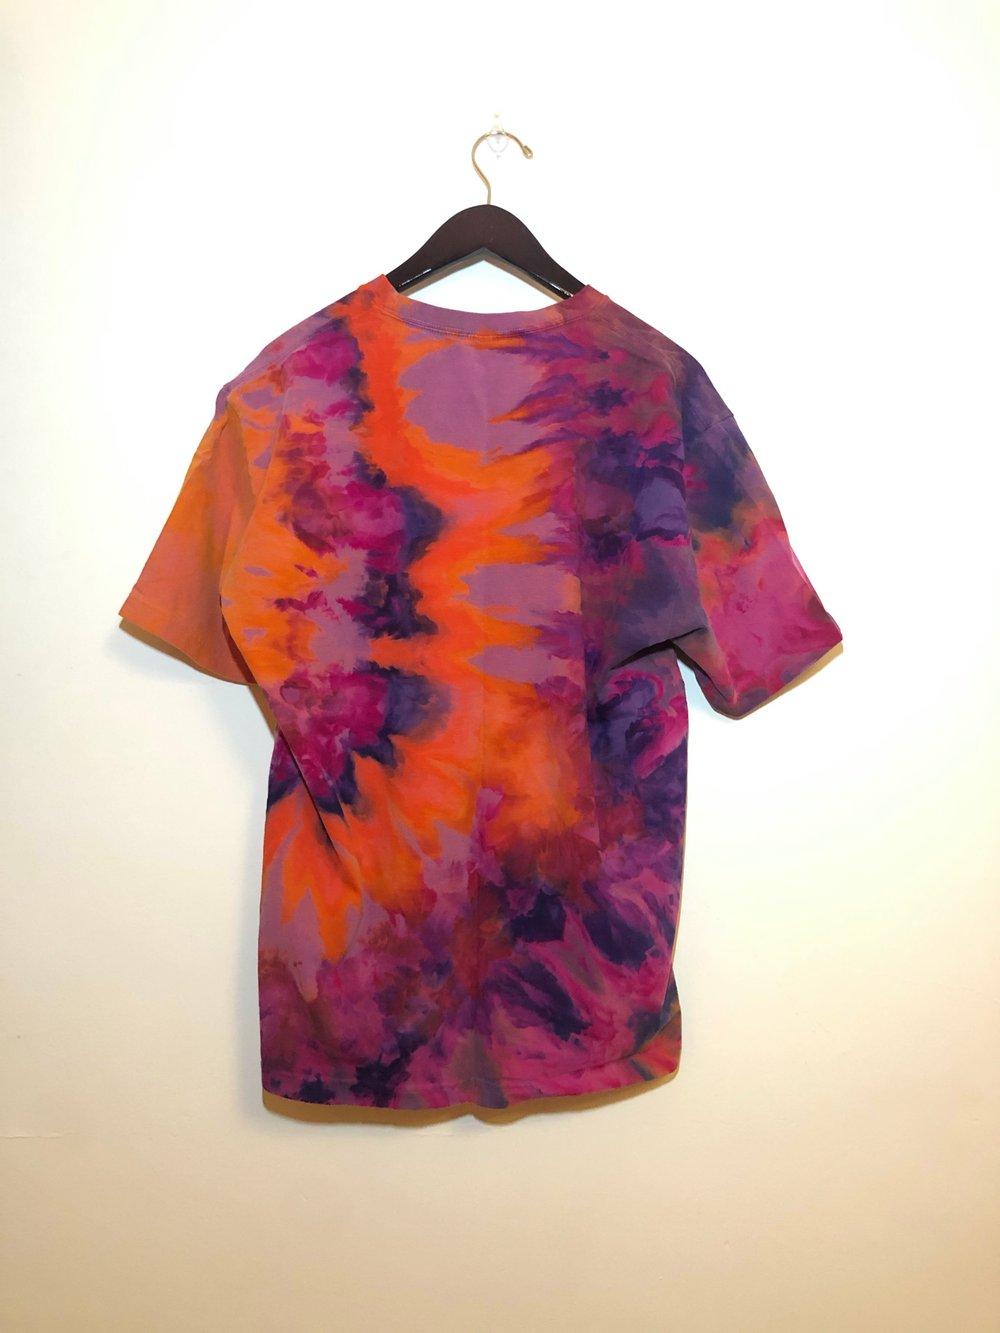 Shirt #25 - Medium